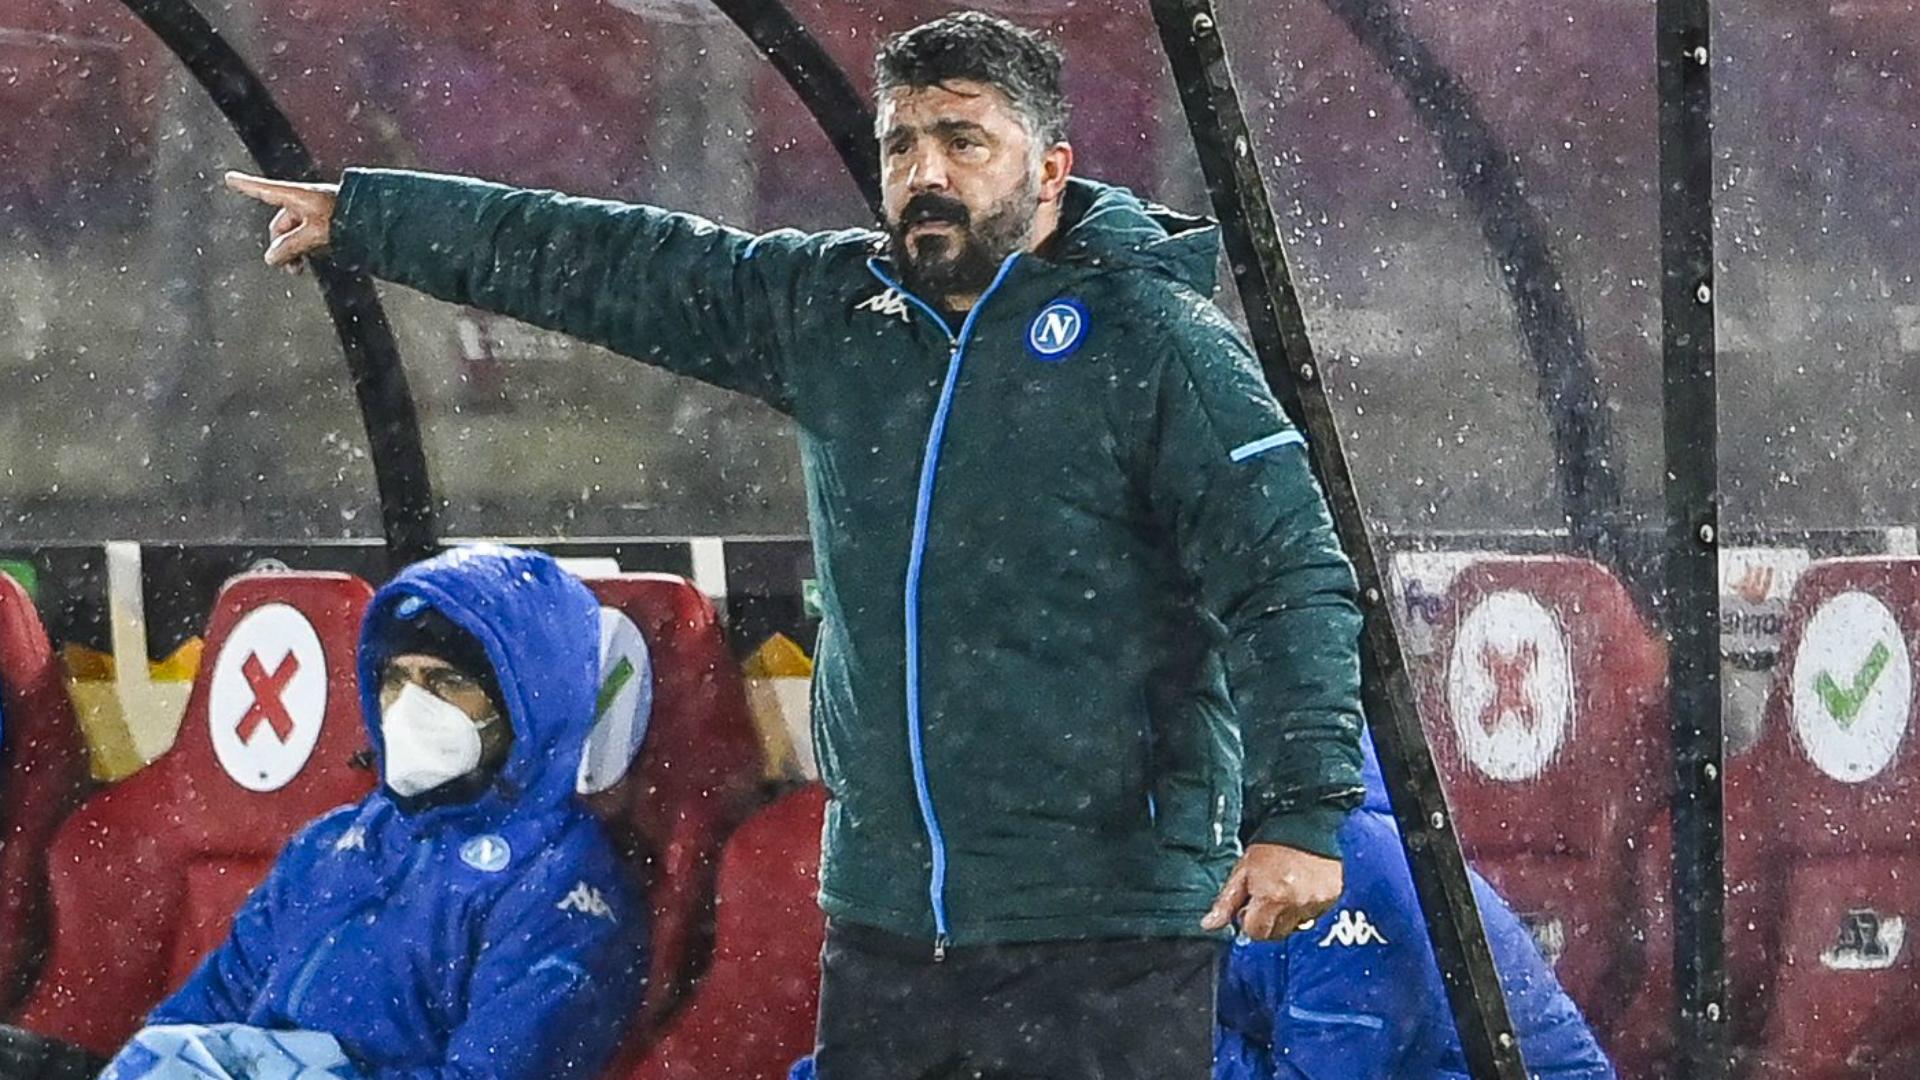 Gattuso has agreed new Napoli deal – Giuntoli